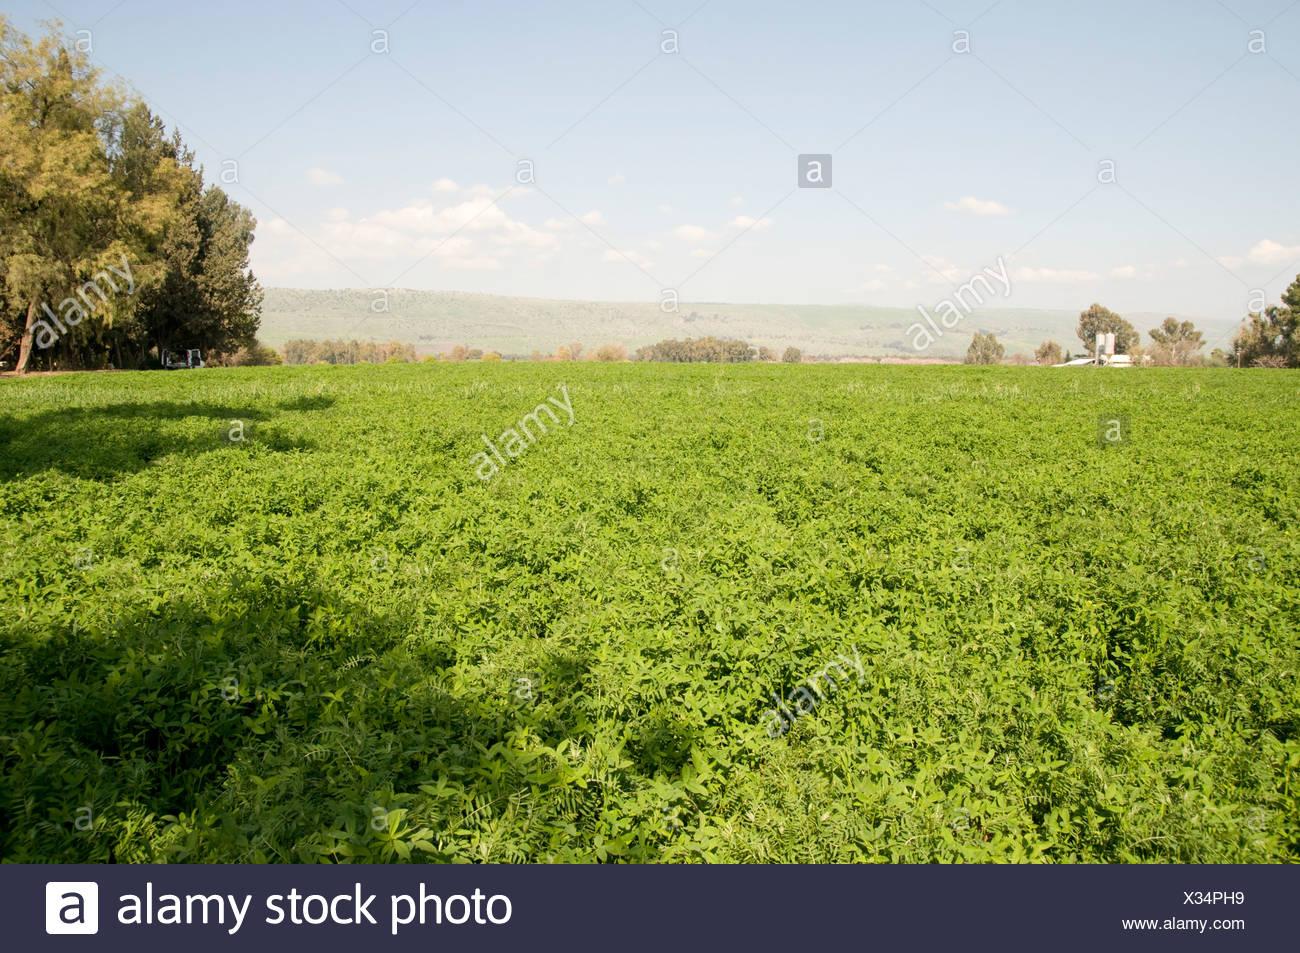 Israel Hula Valley Kibbutz Hulata An endless field of Alfalfa Medicago sativa - Stock Image